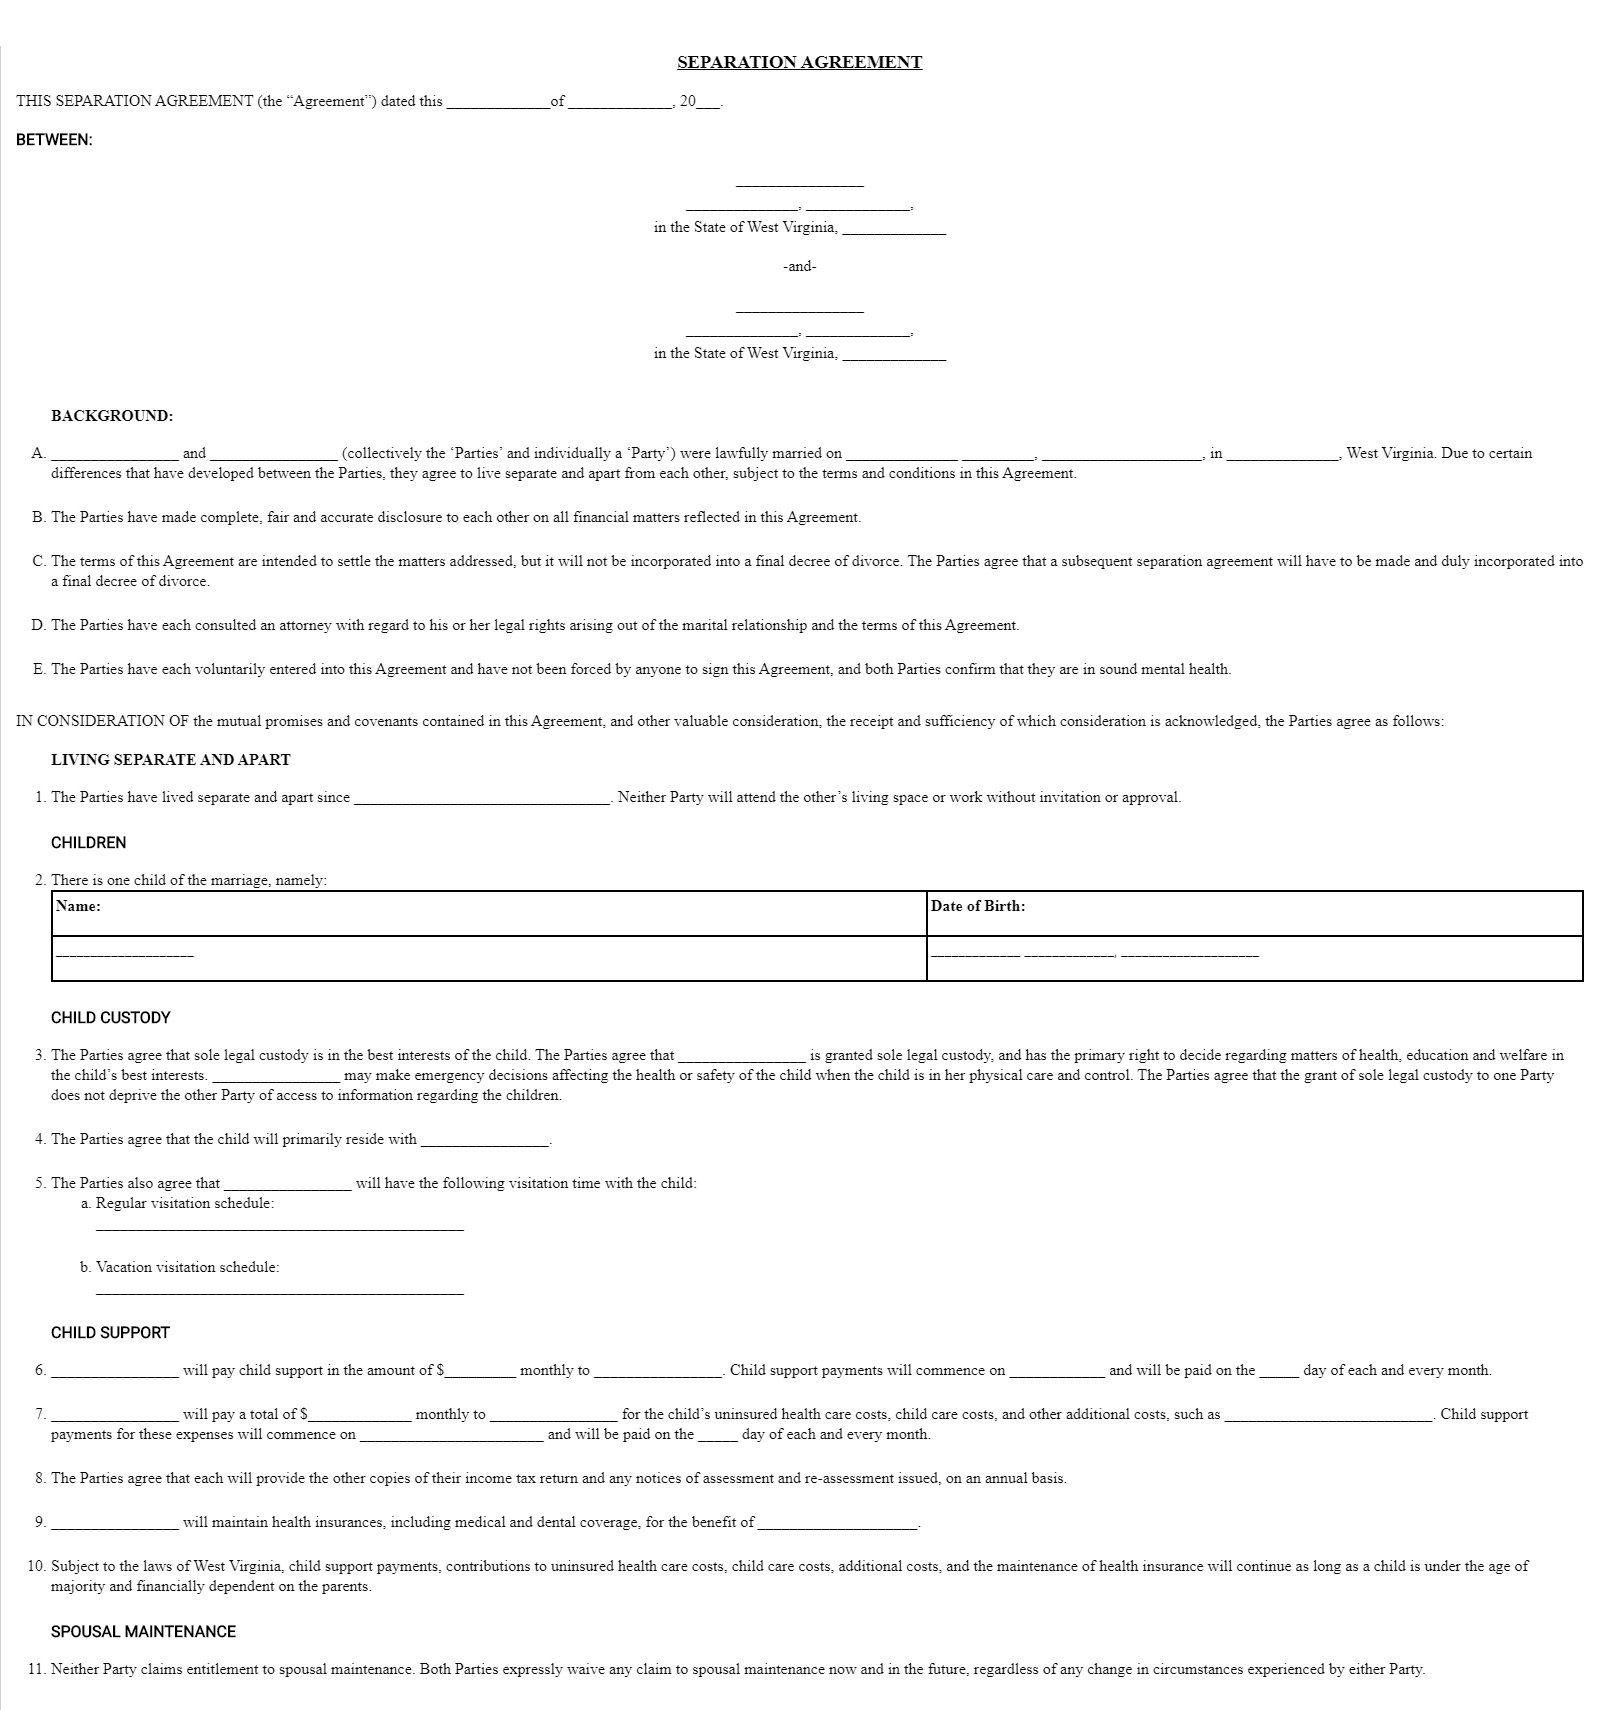 003 Wondrou Virginia Separation Agreement Template Highest Clarity  Marital MarriageFull